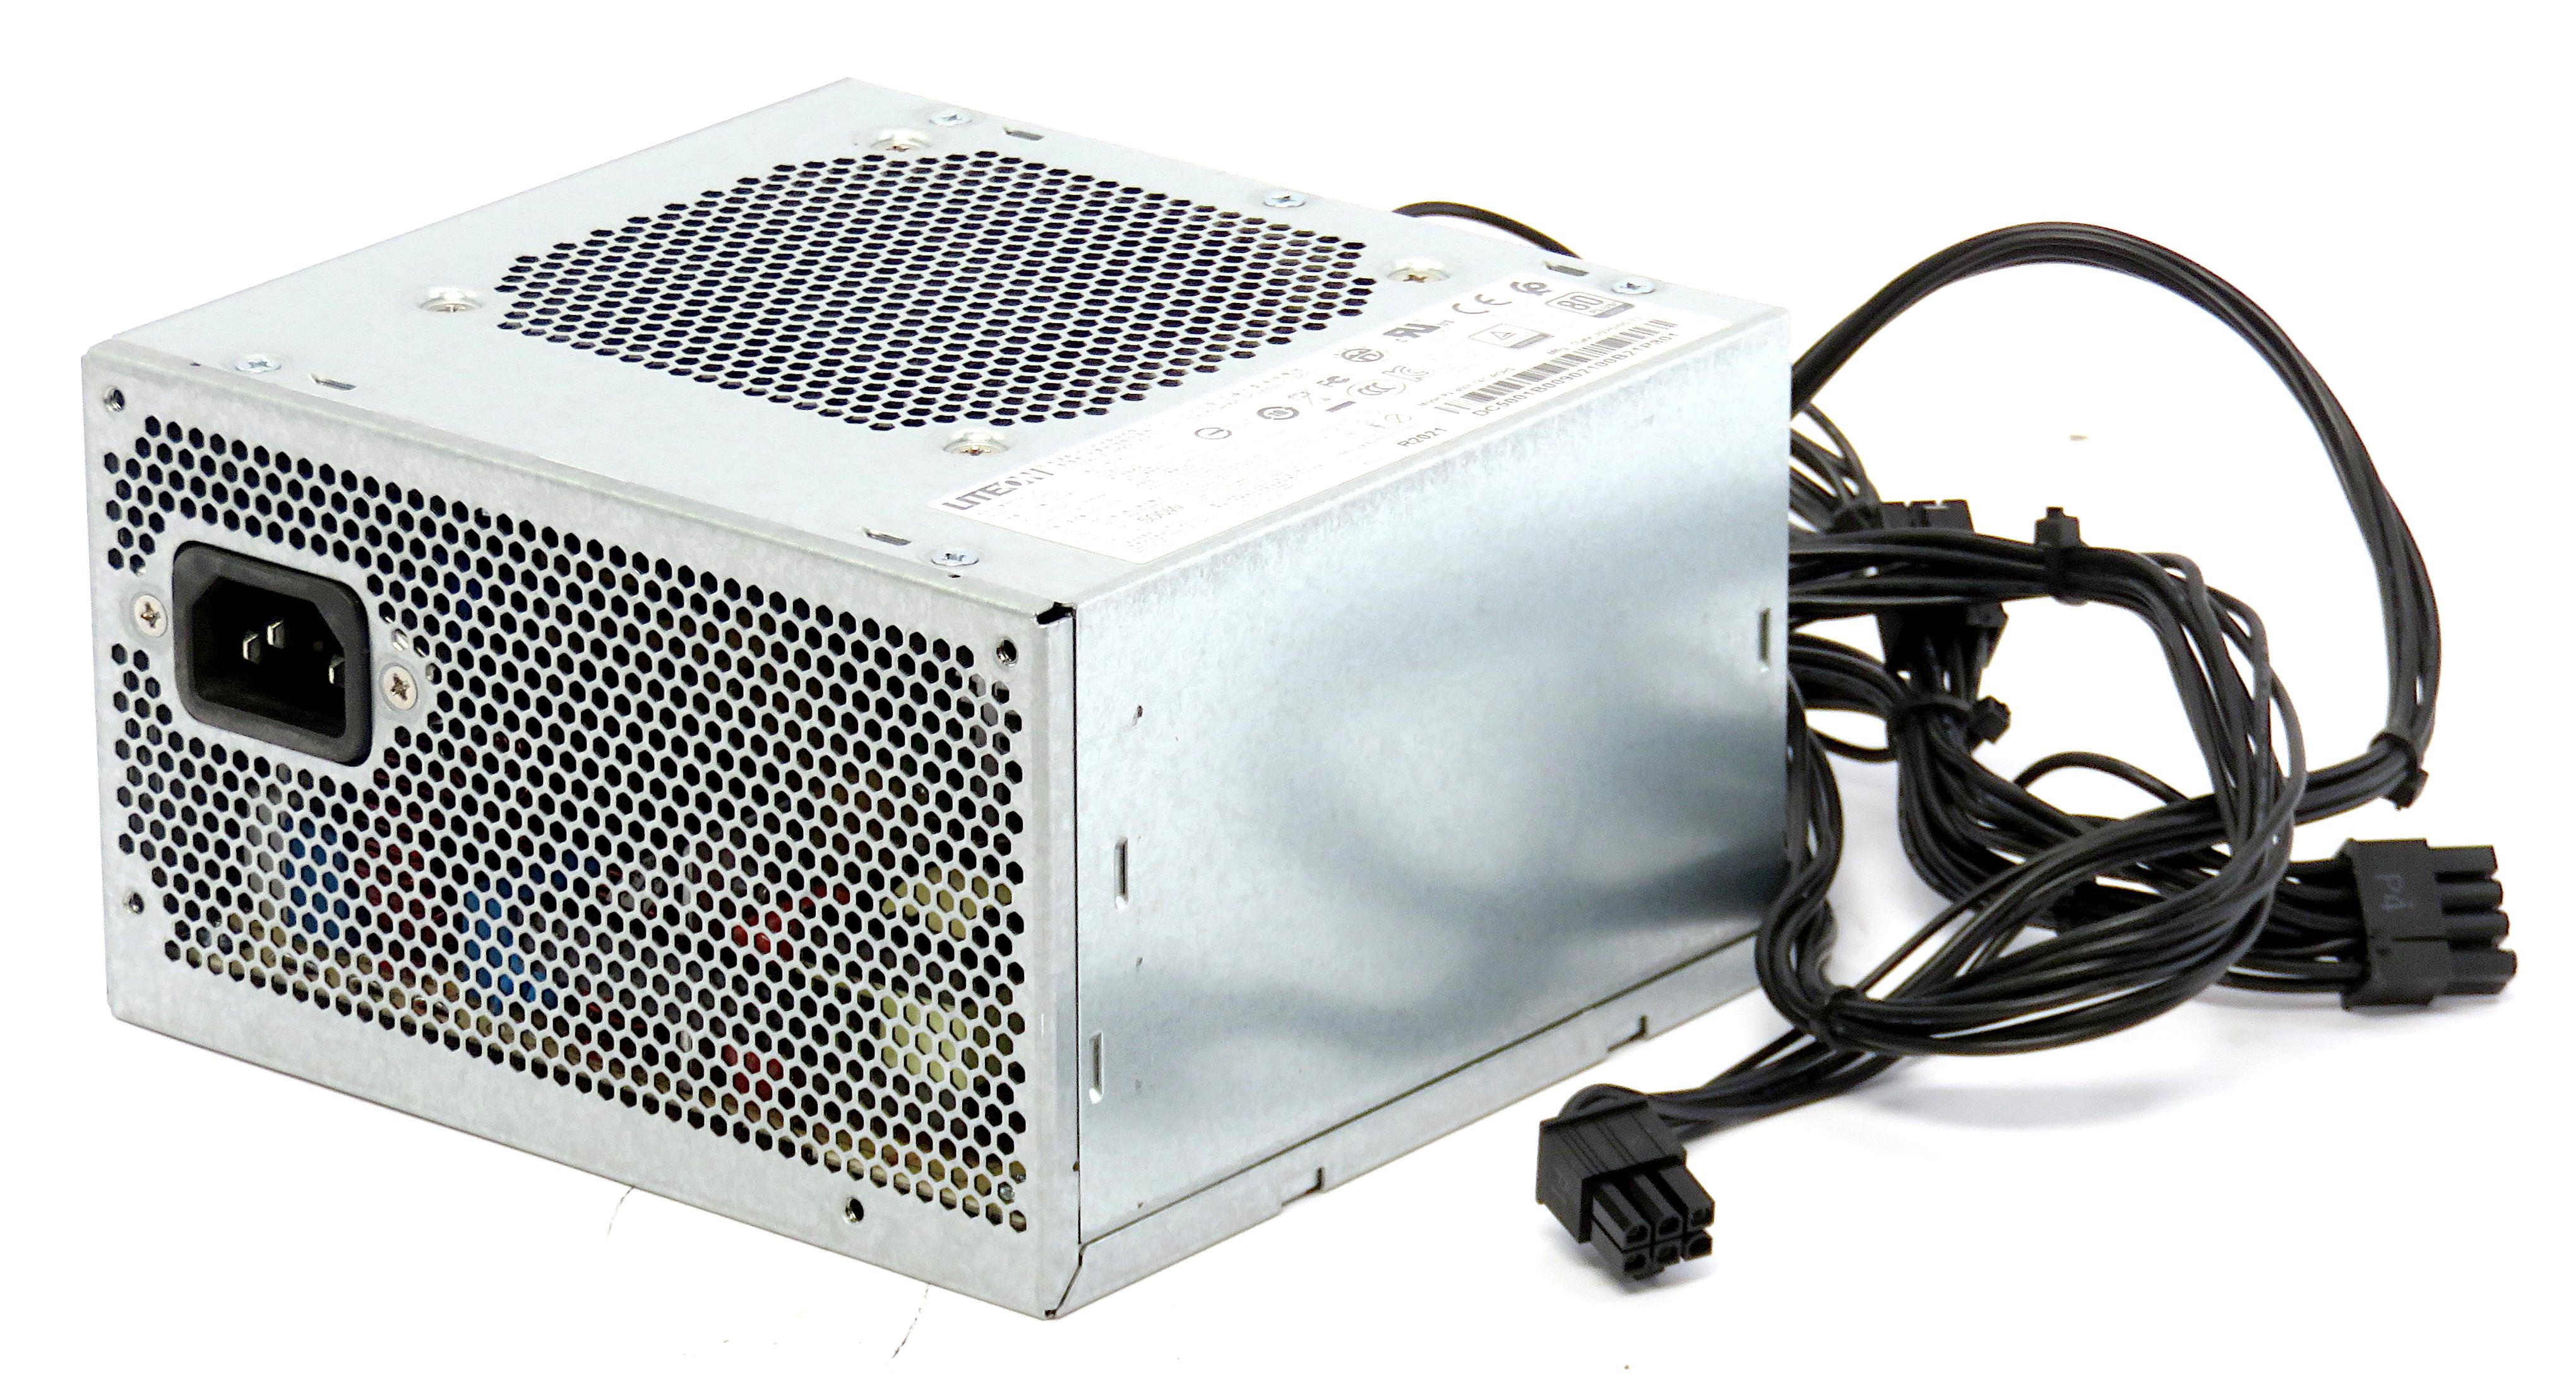 Lite-on PA-4501-1AC 500W 80+ Gold 6-Pin ATX Power Supply f/ Acer Nitro N50-610